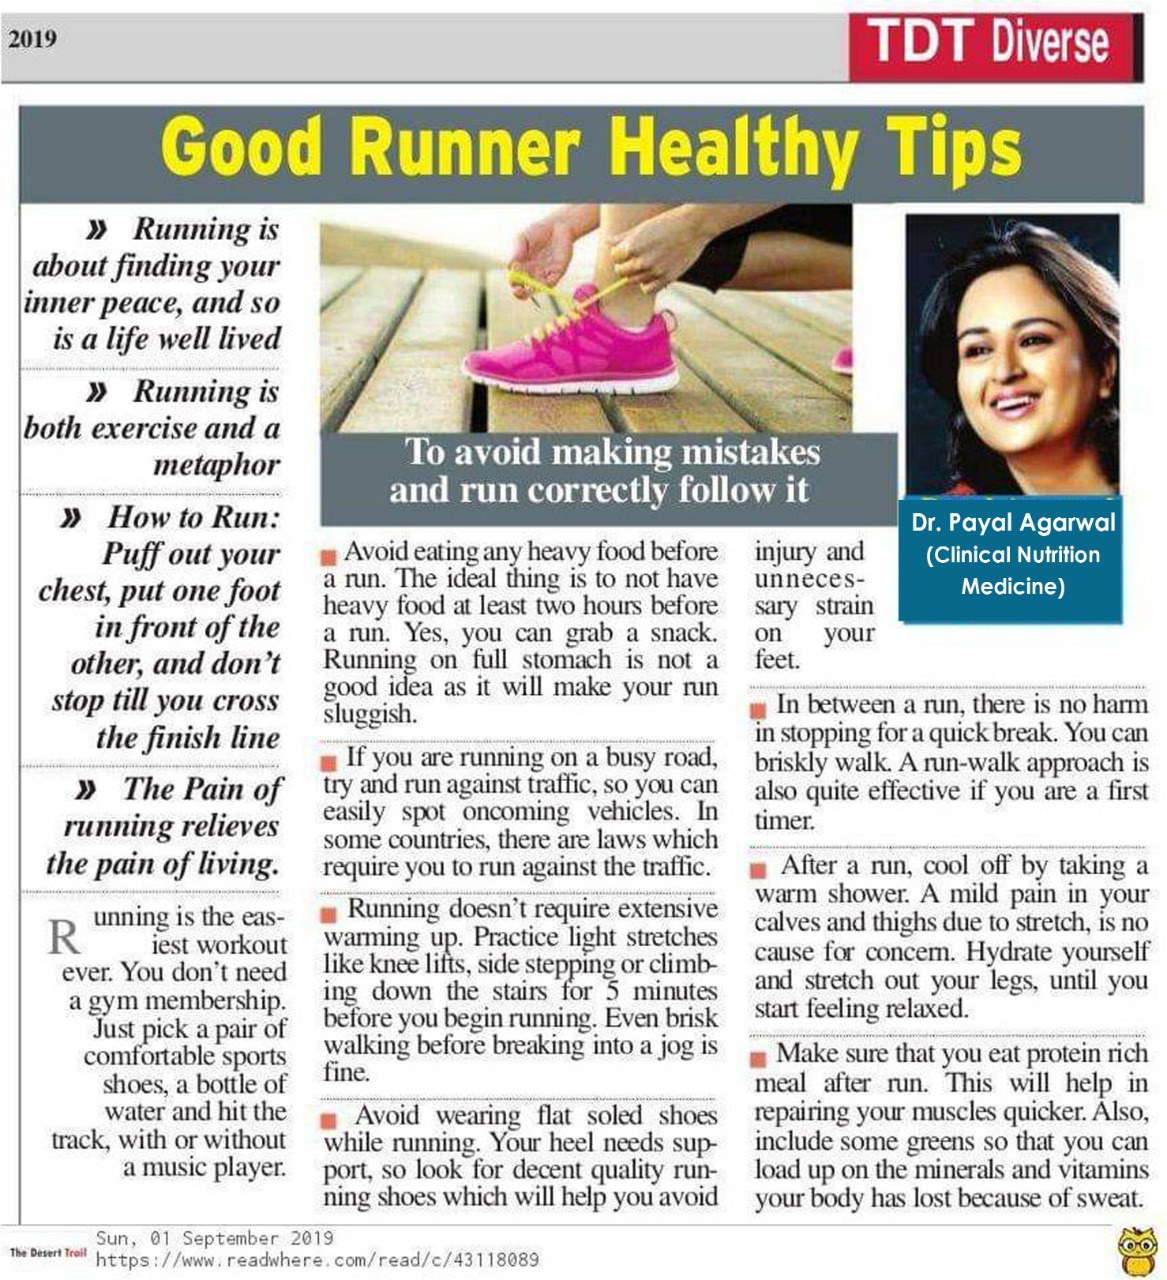 Good Healthy Runner